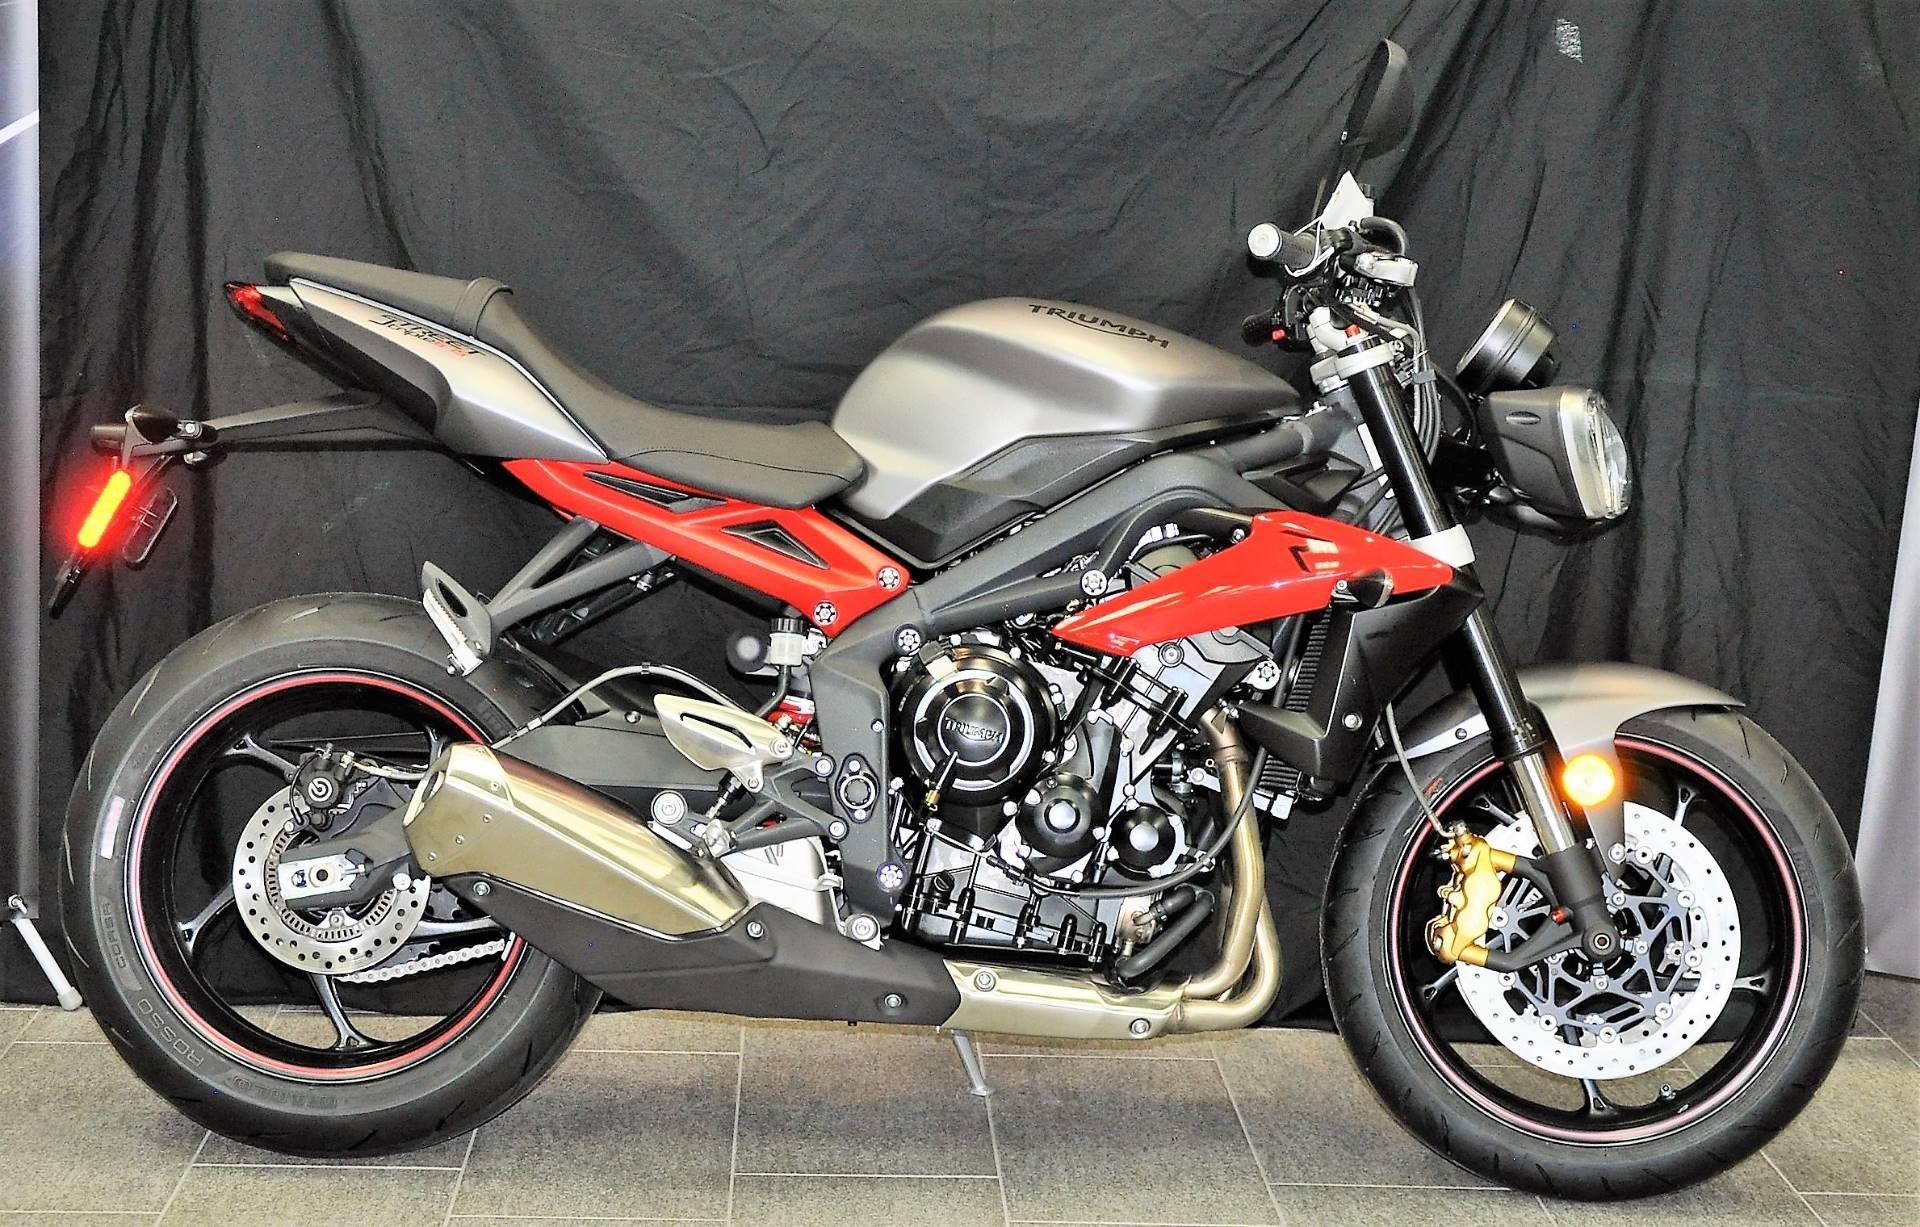 new 2017 triumph street triple r motorcycles in katy, tx | stock